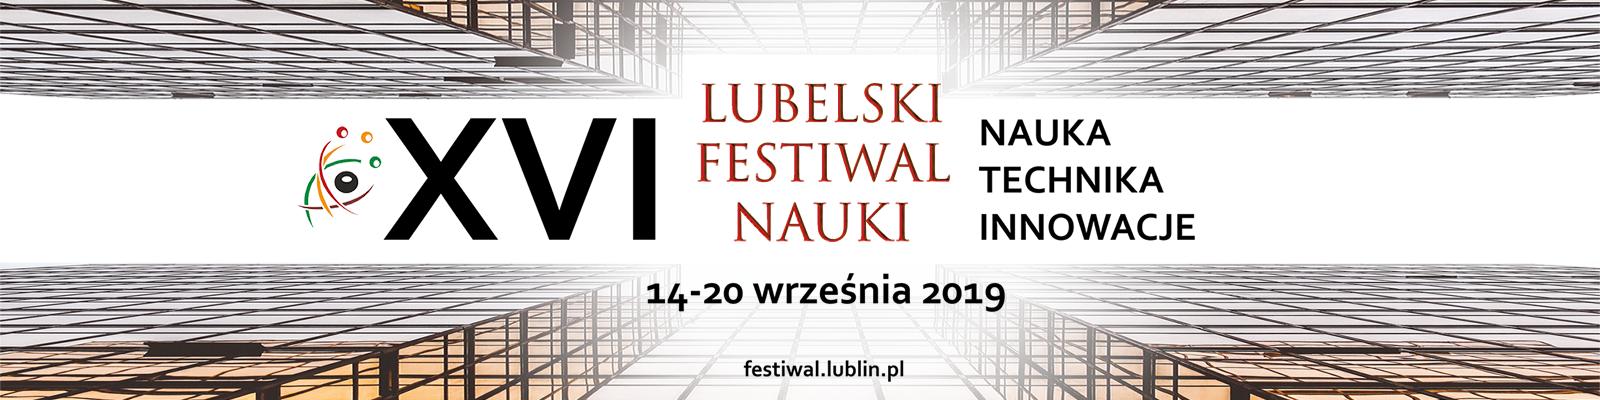 XVI Lubelski Festiwal Nauki (14-20.09.)